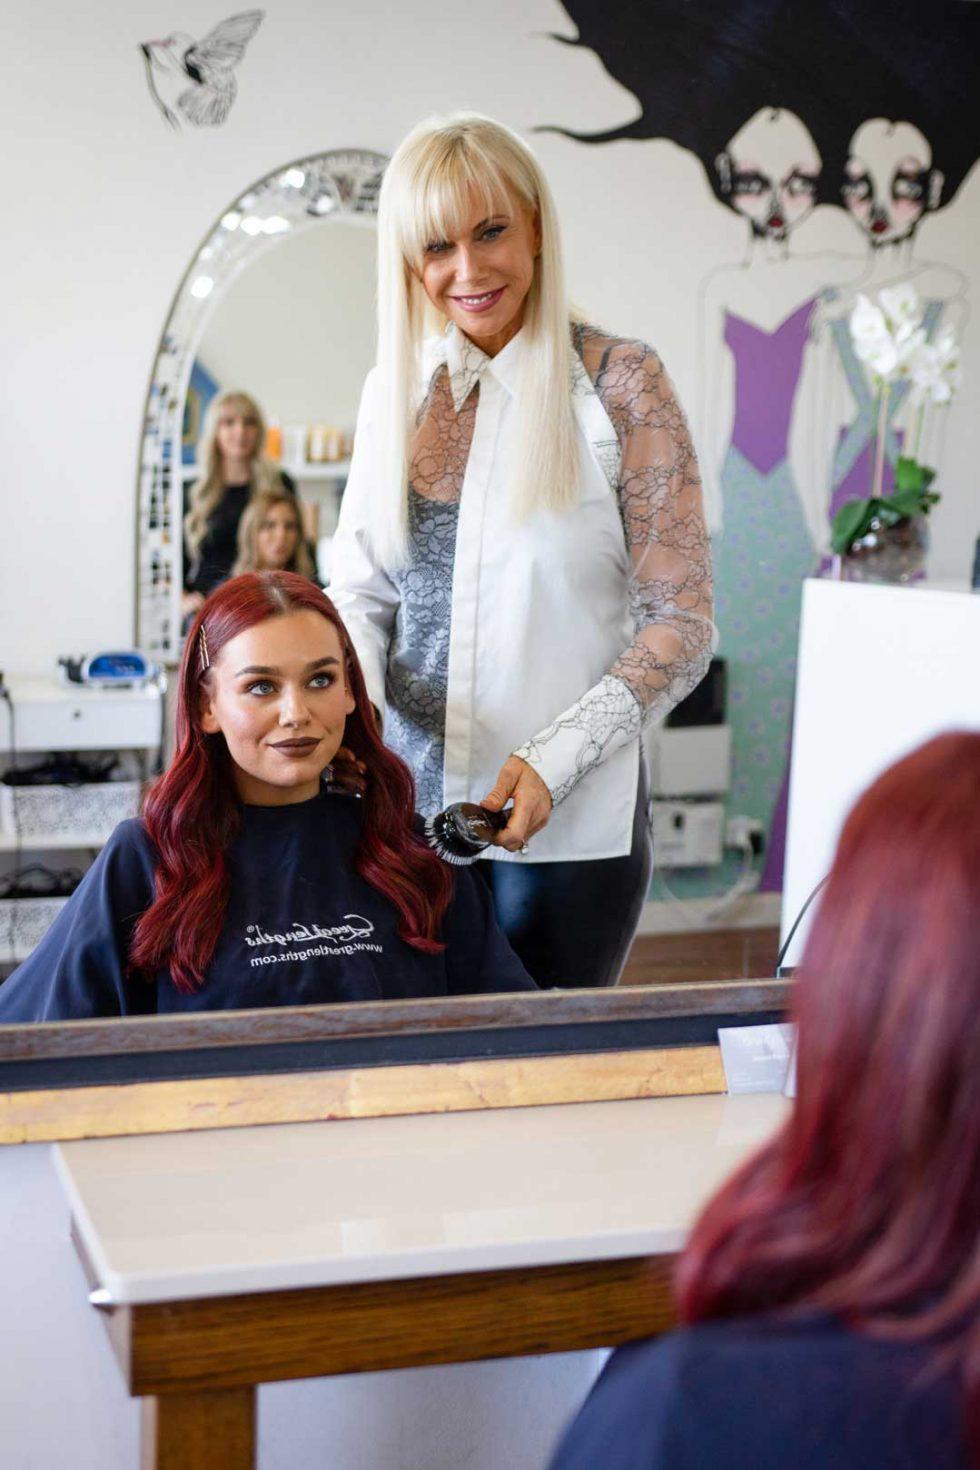 Naomi-Panizza-Hair-Extenions-Perth-Studio-10